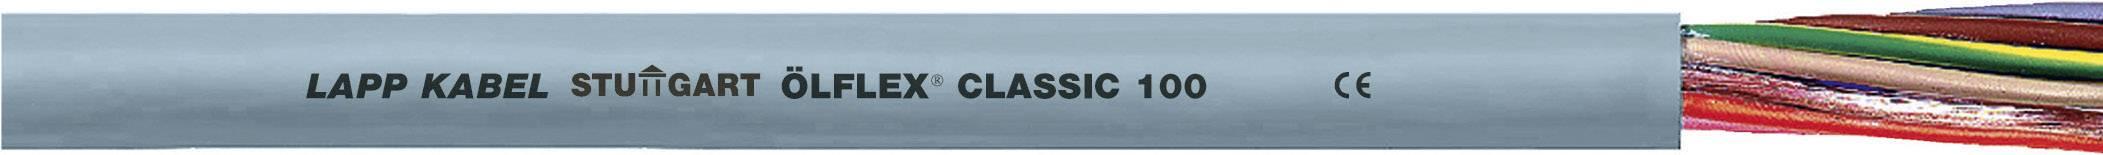 Kabel LappKabel Ölflex CLASSIC 100 12G0,75 (0010030), PVC, 9,9 mm, 500 V, šedá, 50 m